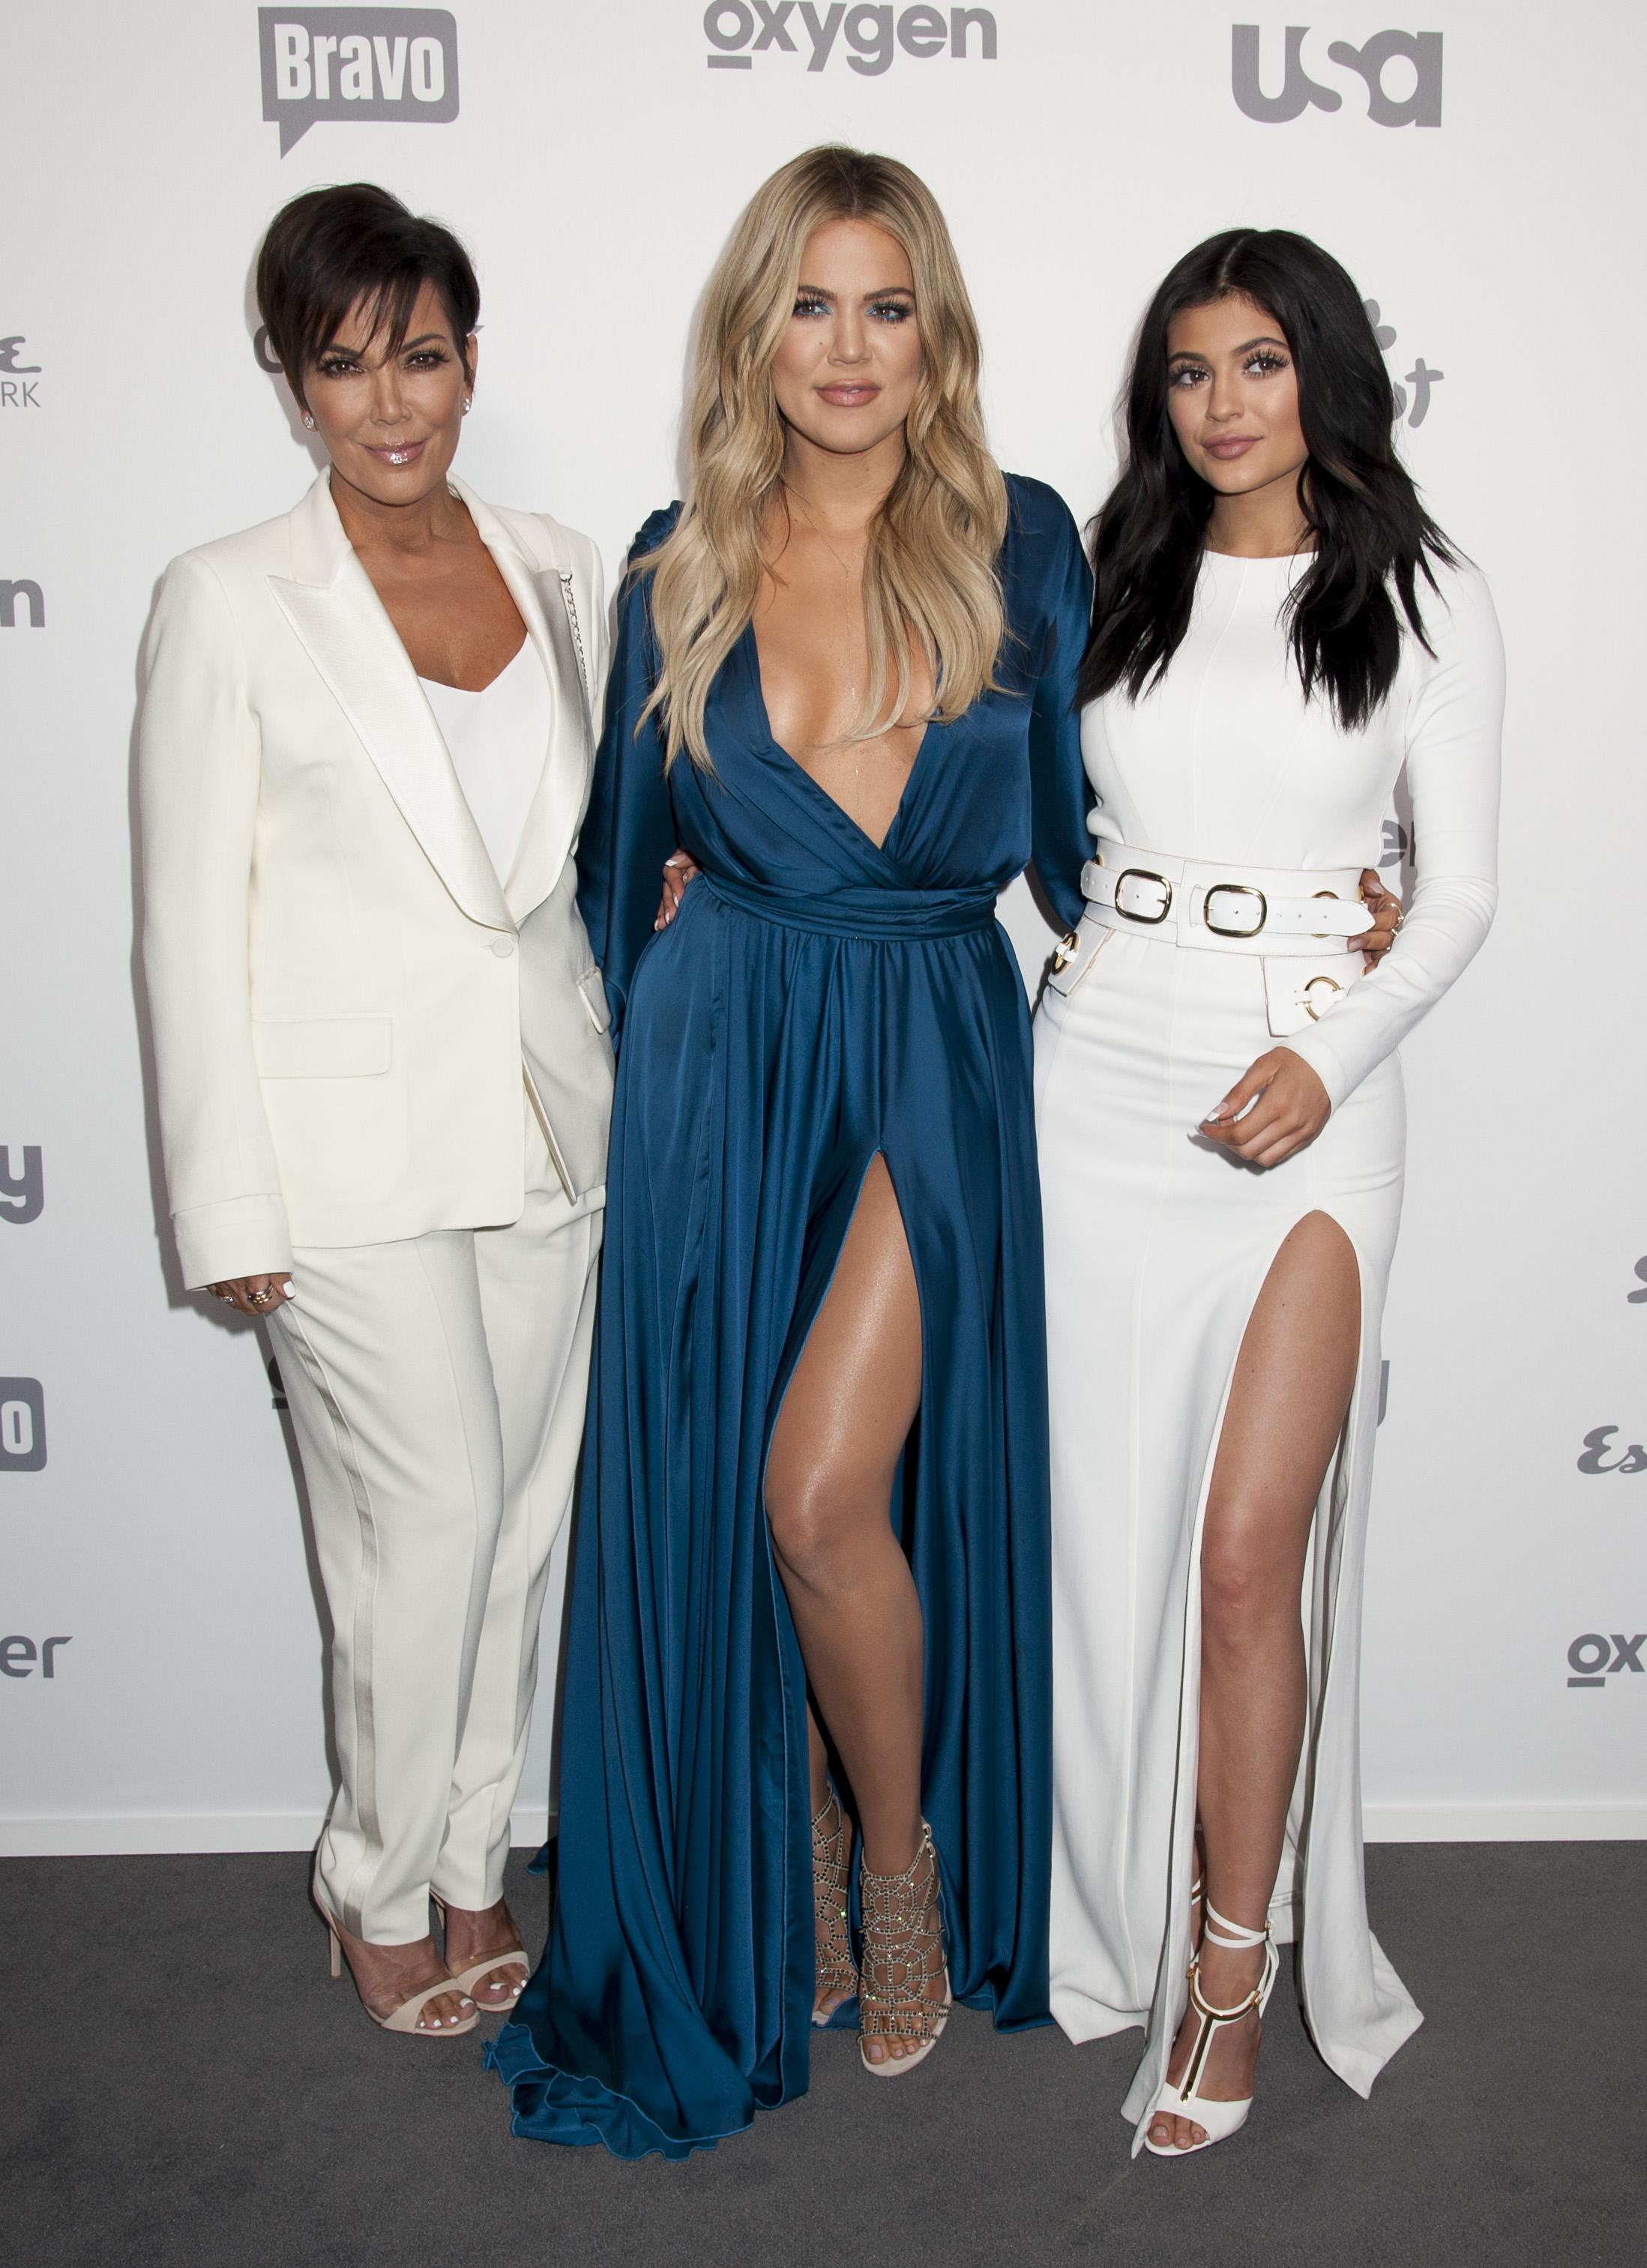 Kylie Jenner, Khloe Kardashian, Kris Jenner at the NBC Universal Upfronts